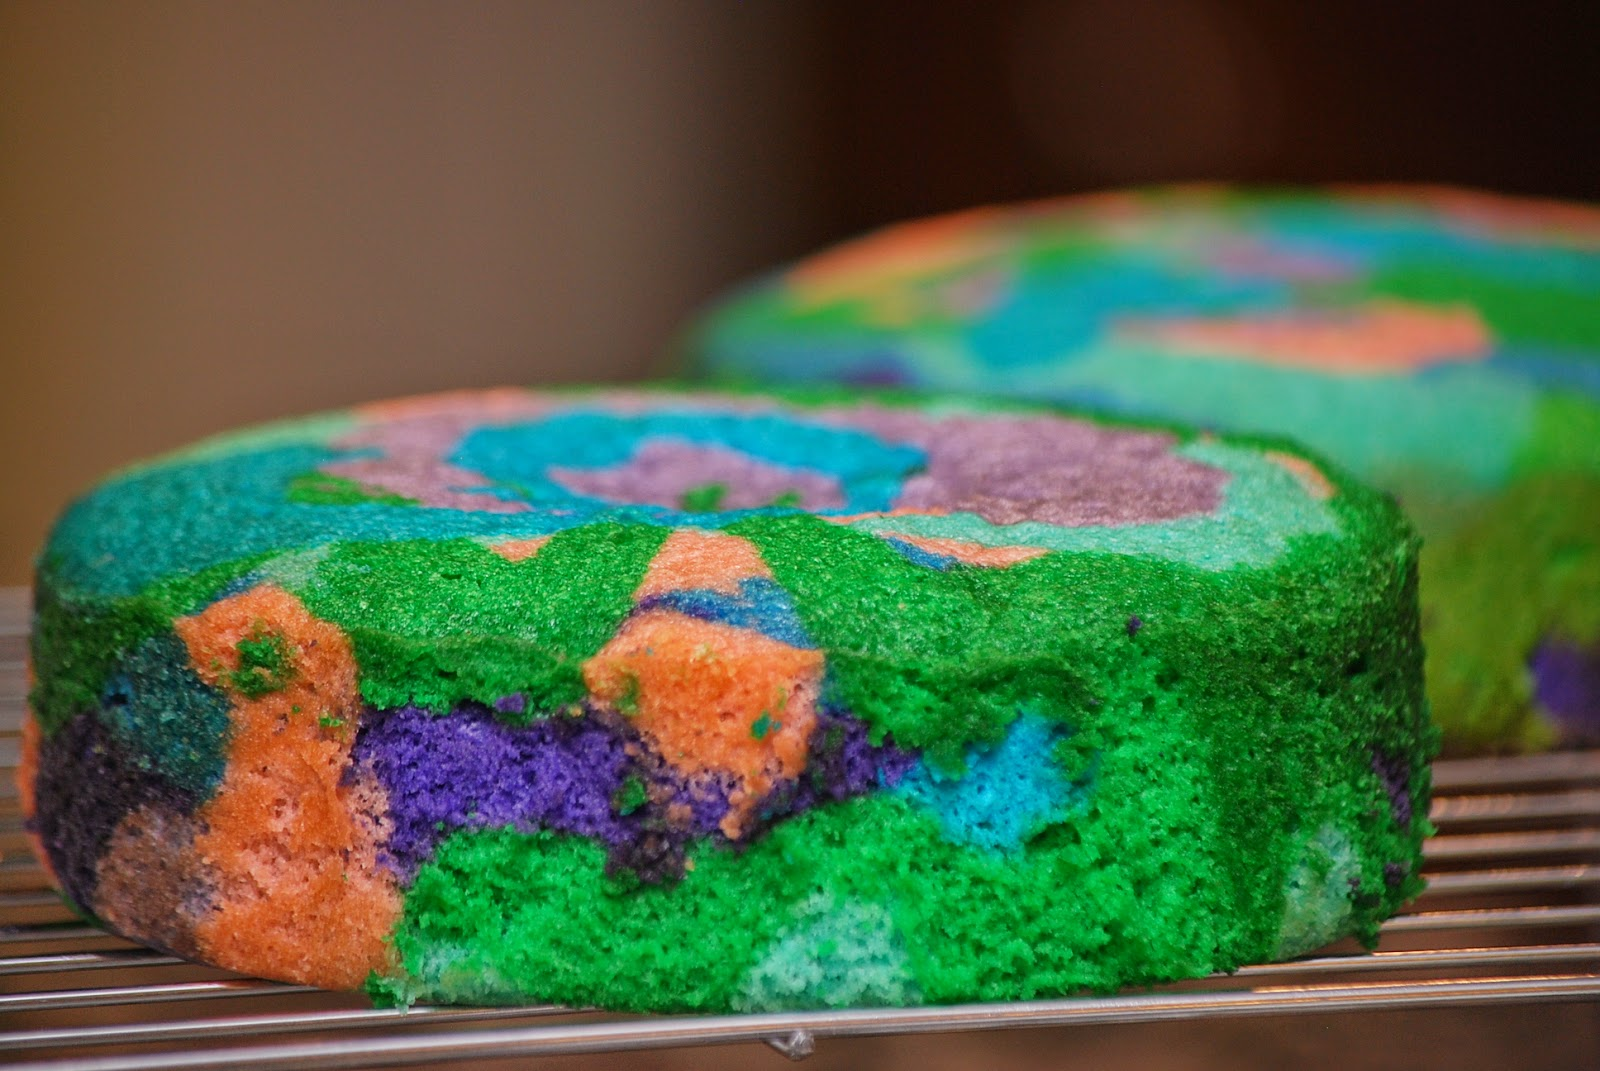 My Story In Recipes Tie Dye Cake